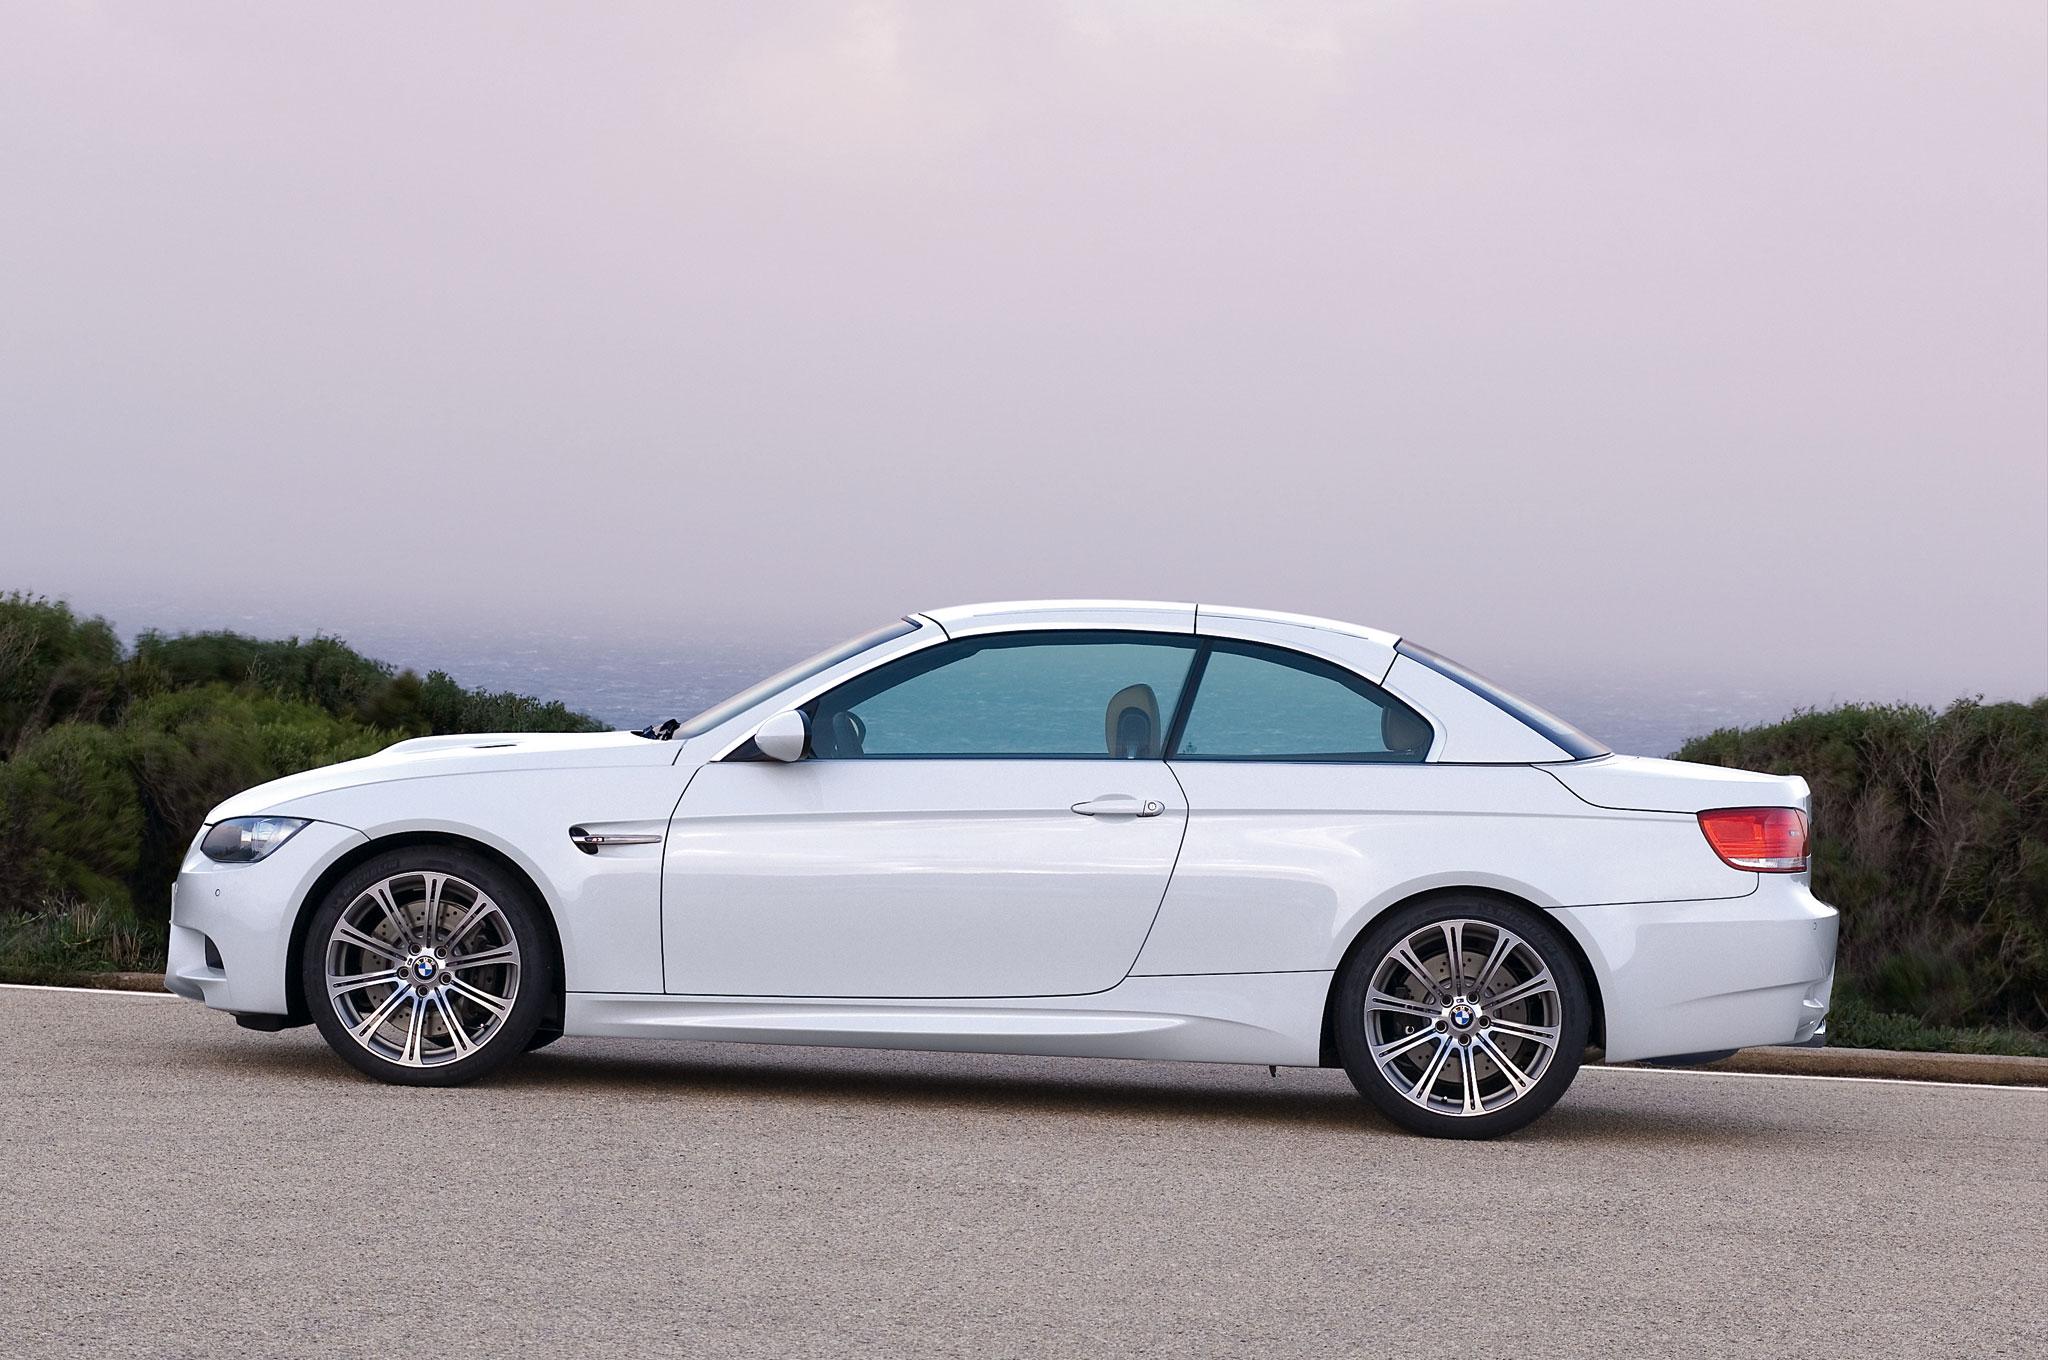 2013 BMW M3 Lime Rock Edition - Editors' Notebook - Automobile Magazine